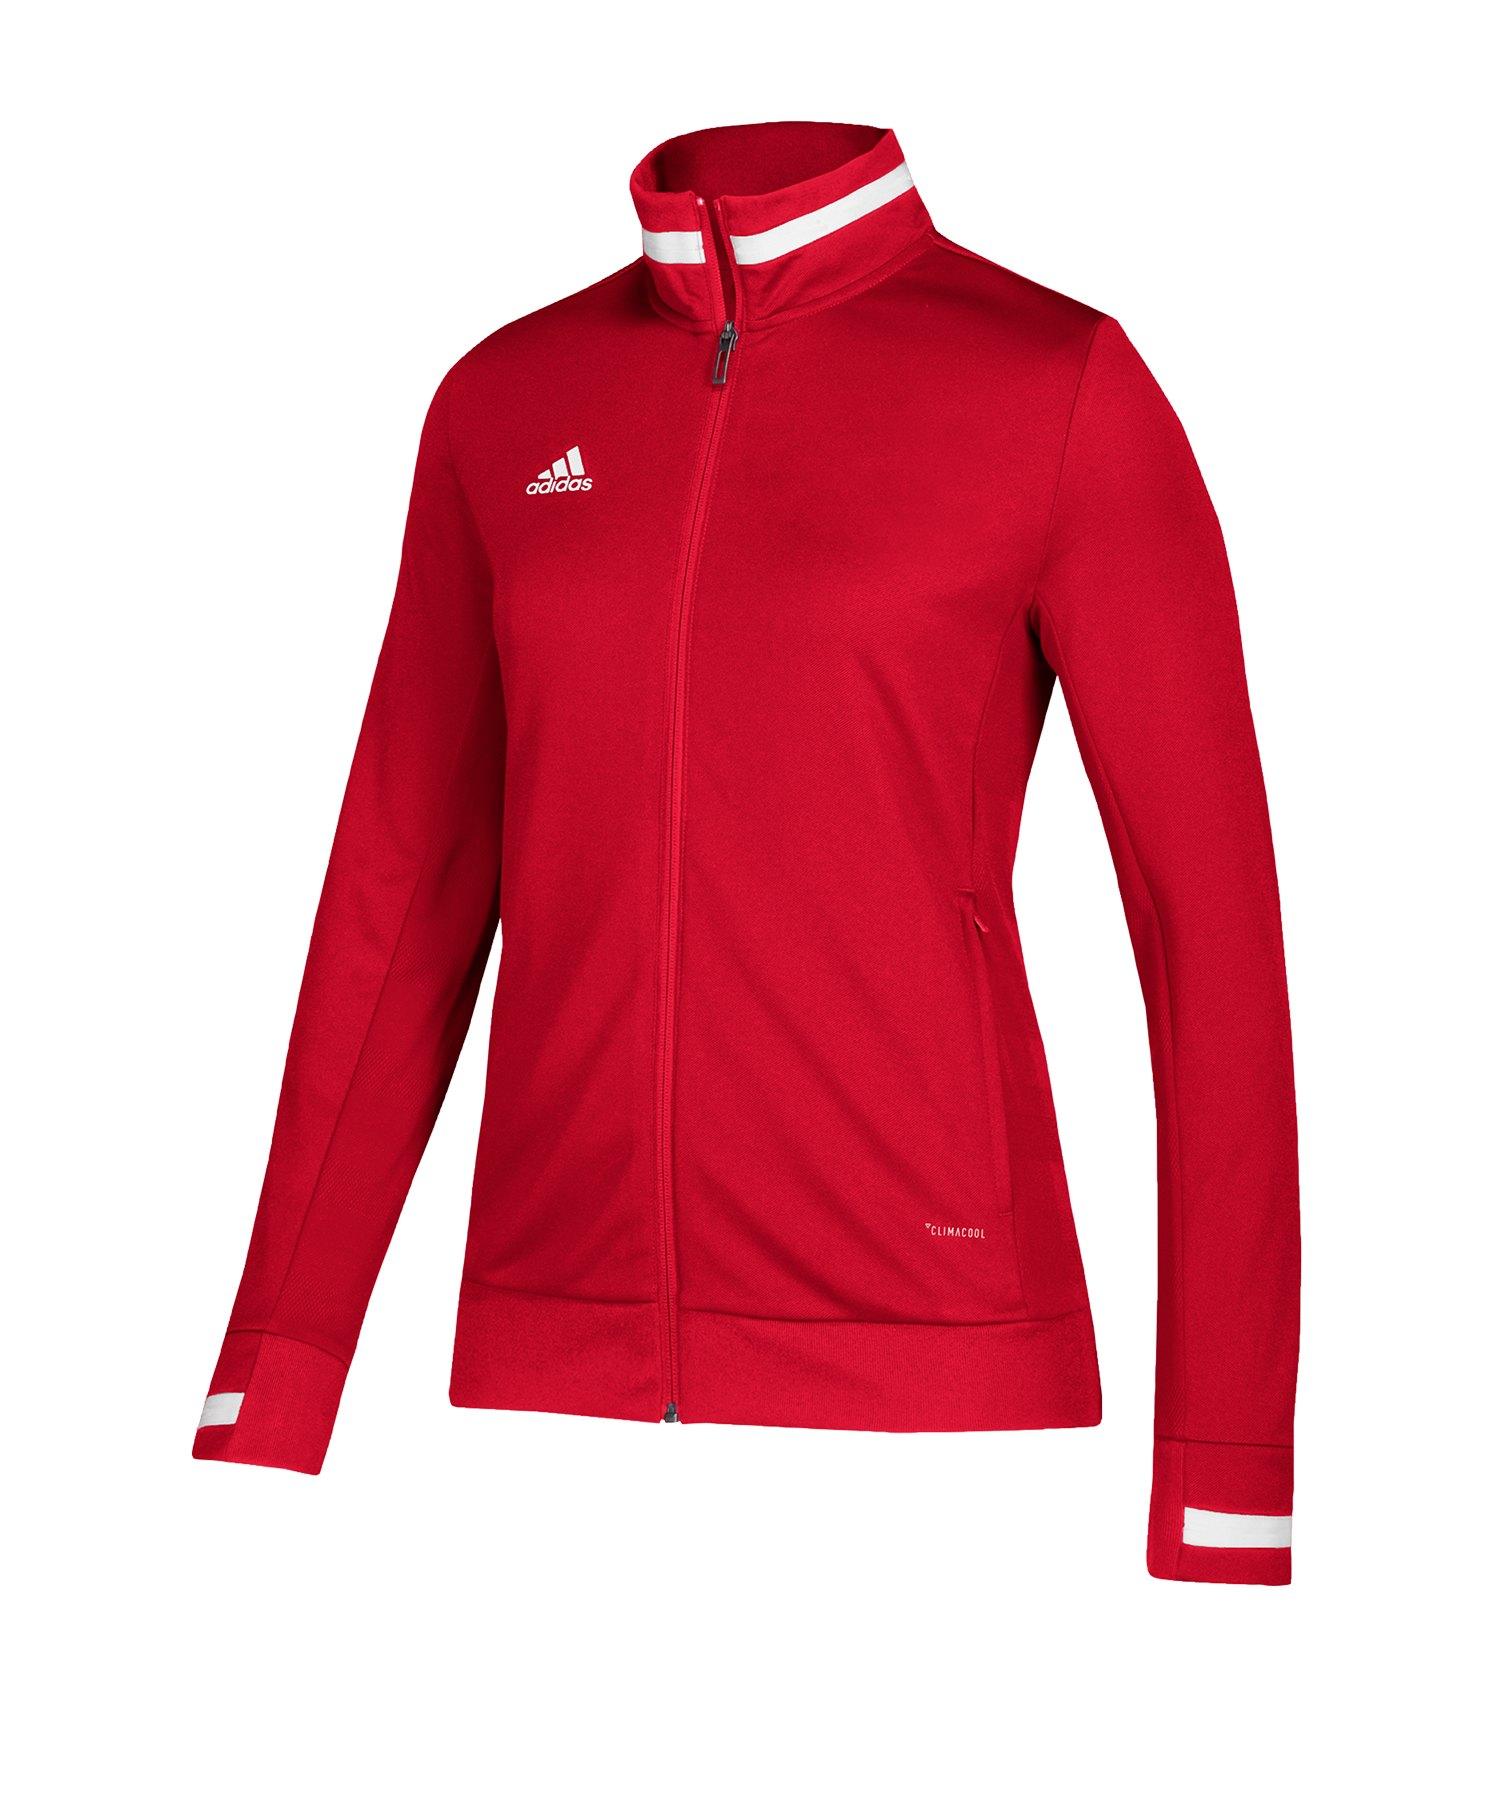 adidas Team 19 Track Jacket Damen Rot Weiss - rot